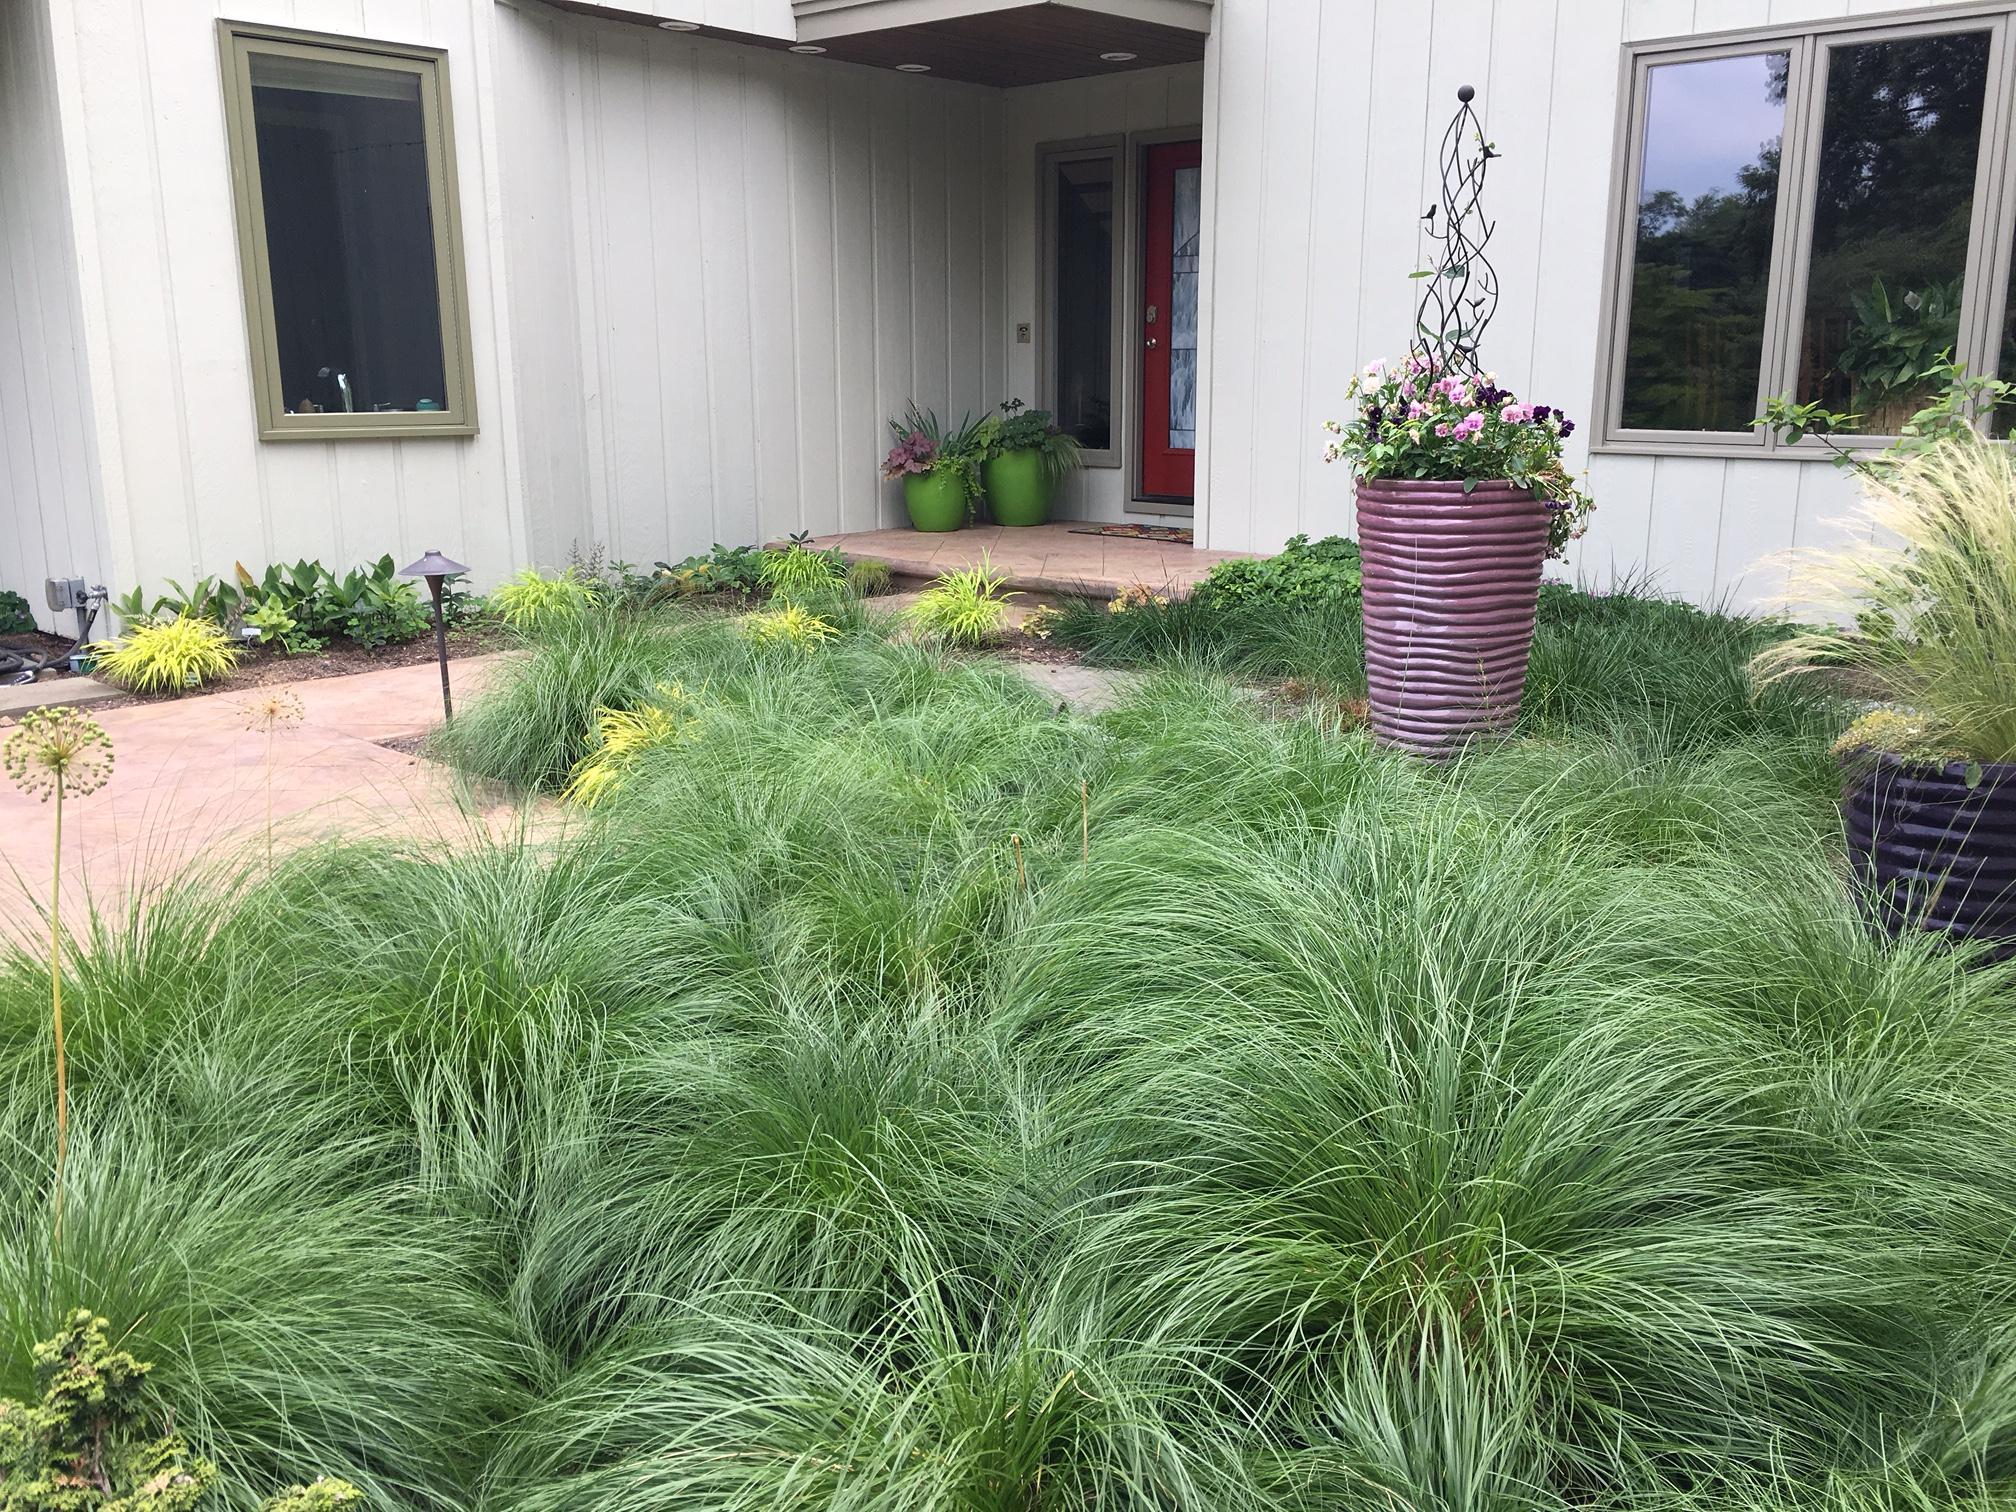 Imperfect gardening (5)